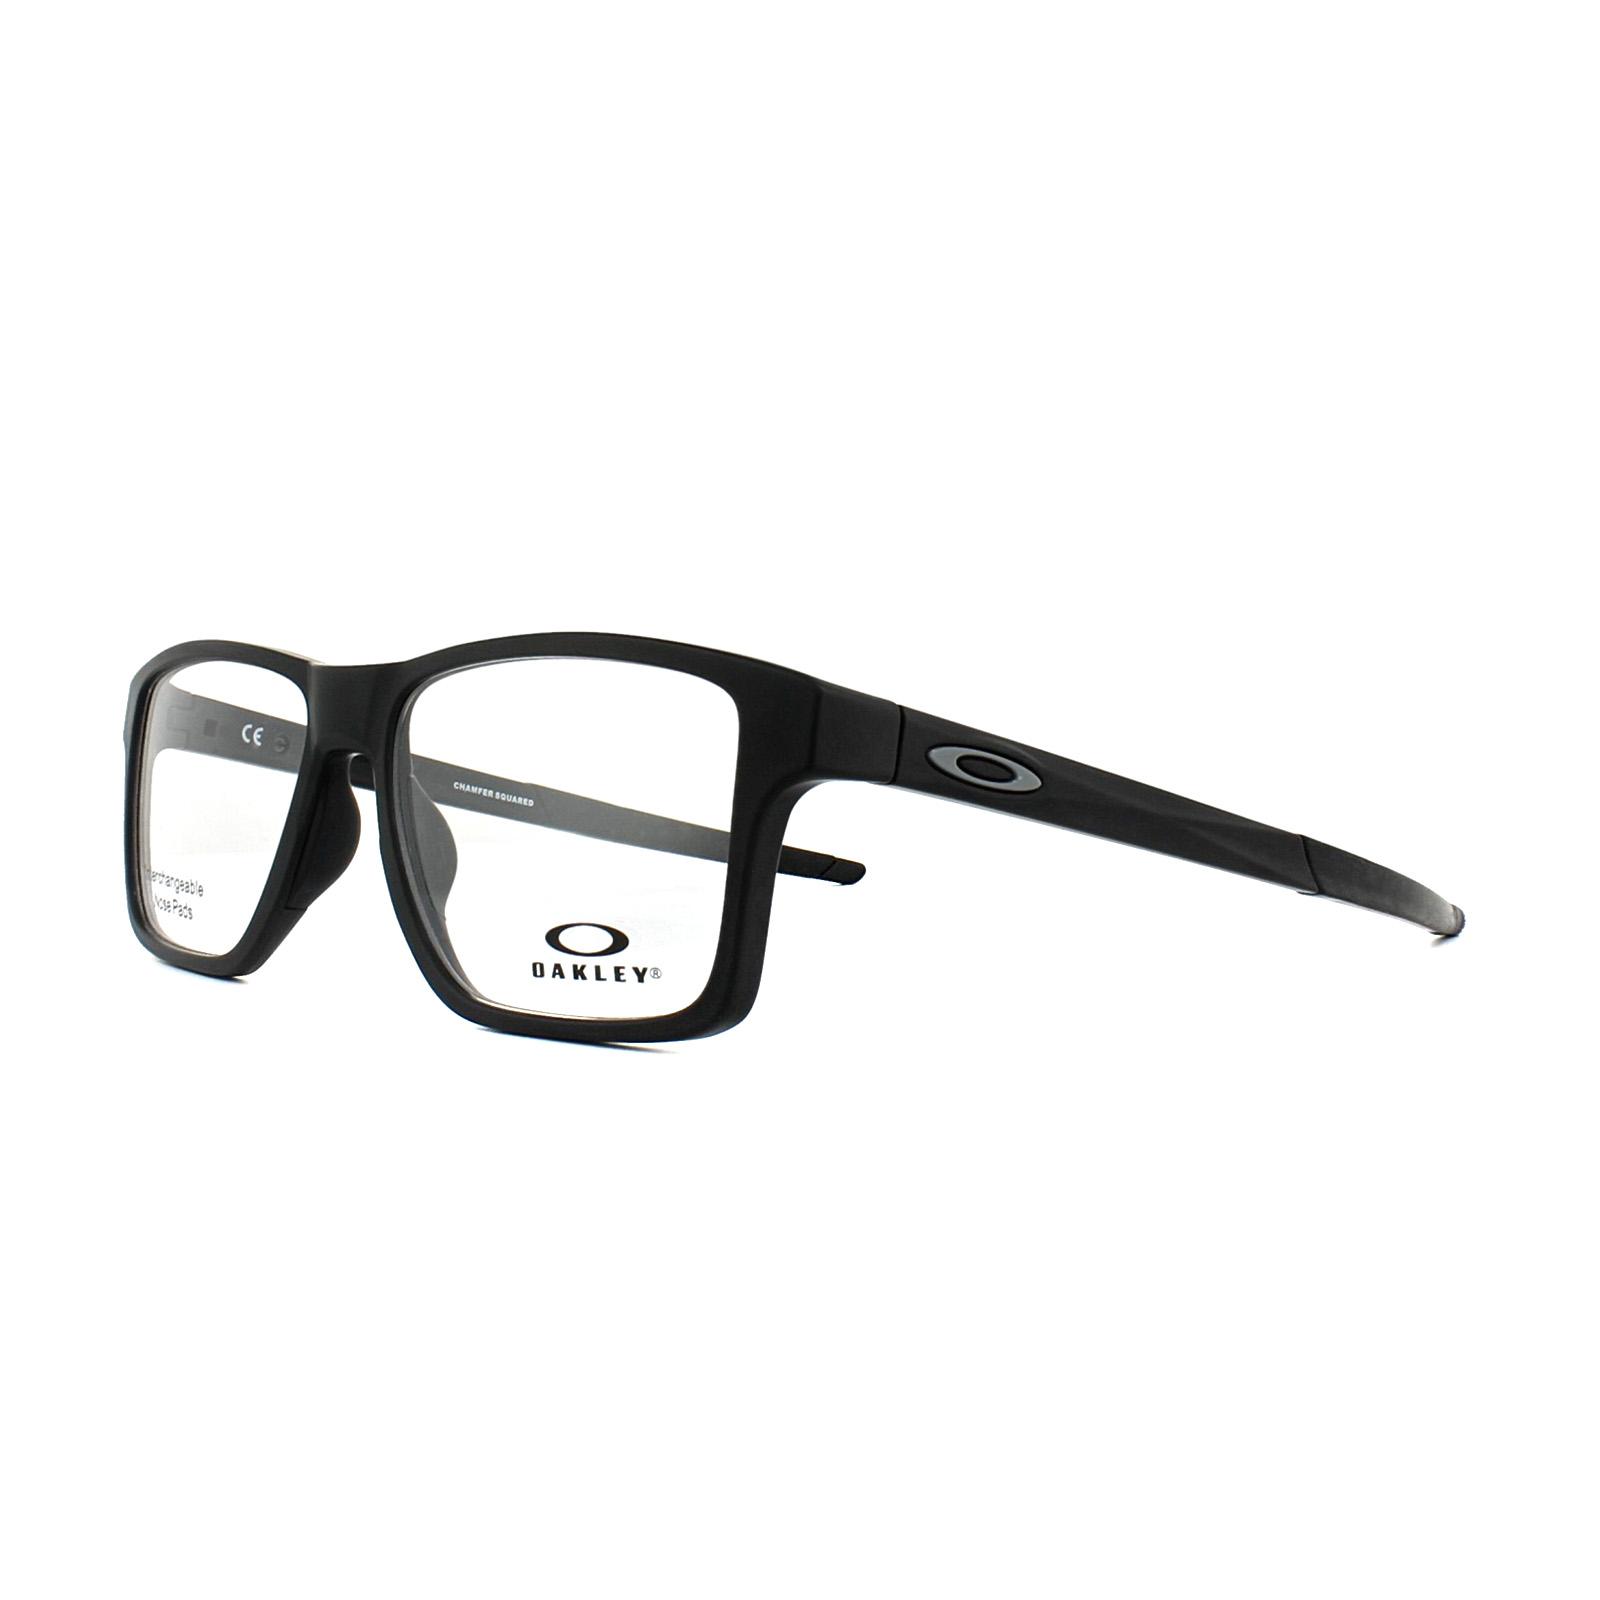 928b0752fe46 Sentinel Oakley Glasses Frames Chamfer Squared OX8143-01 Satin Black 54mm  Mens